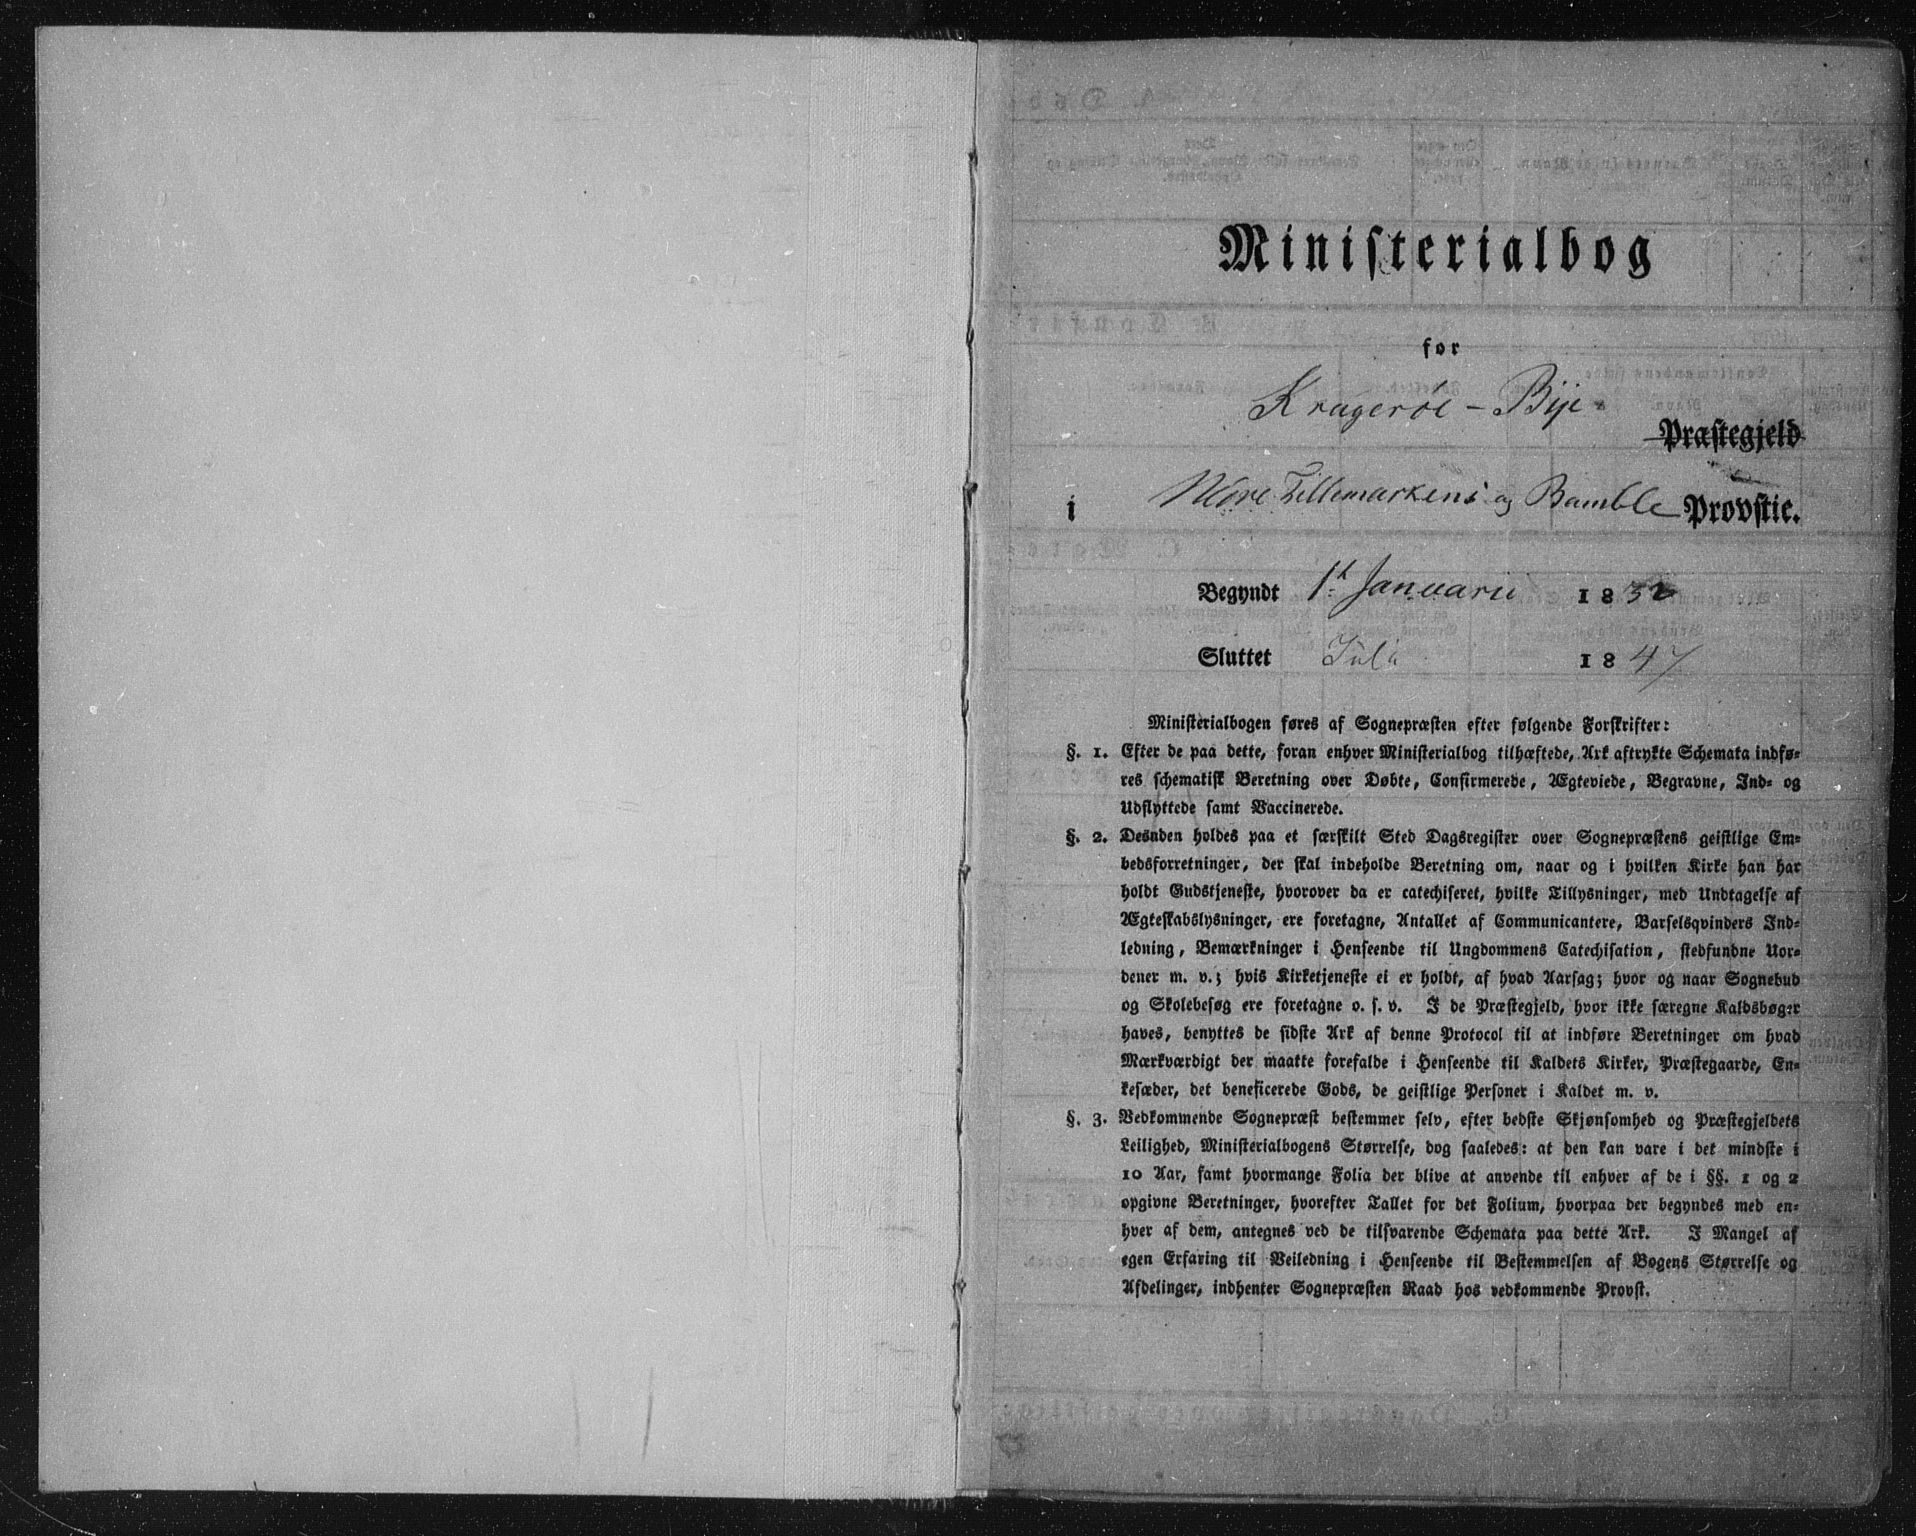 SAKO, Kragerø kirkebøker, F/Fa/L0005: Ministerialbok nr. 5, 1832-1847